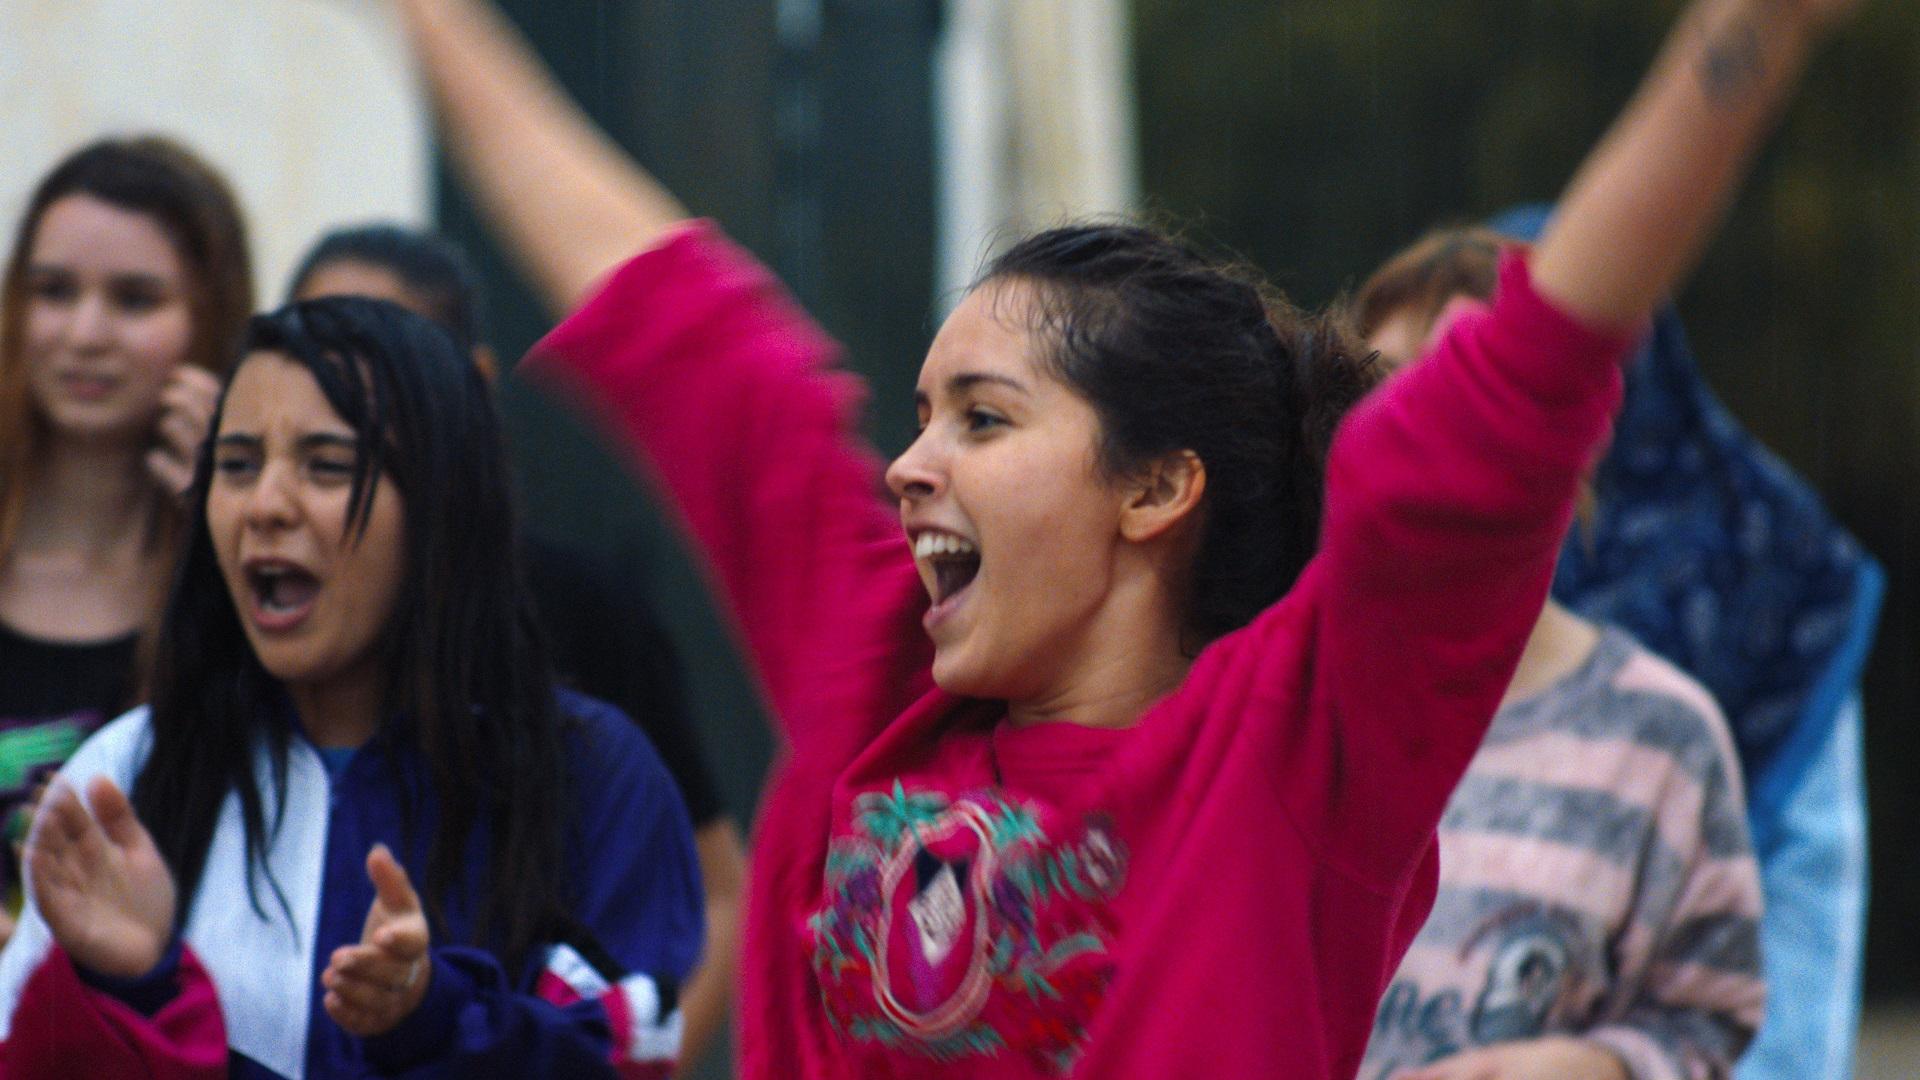 TEA Tenerife proyecta este fin de semana el filme Papicha, sueños de libertad, de Mounia Meddour